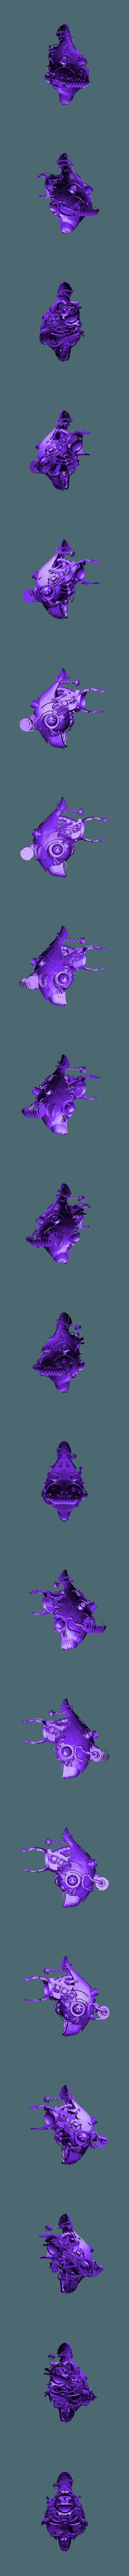 Grimdark_Kastelan_with_holy_incense.stl Download free STL file Grimdark Chrono Trigger Bits • 3D printer object, ErikTheHeretek